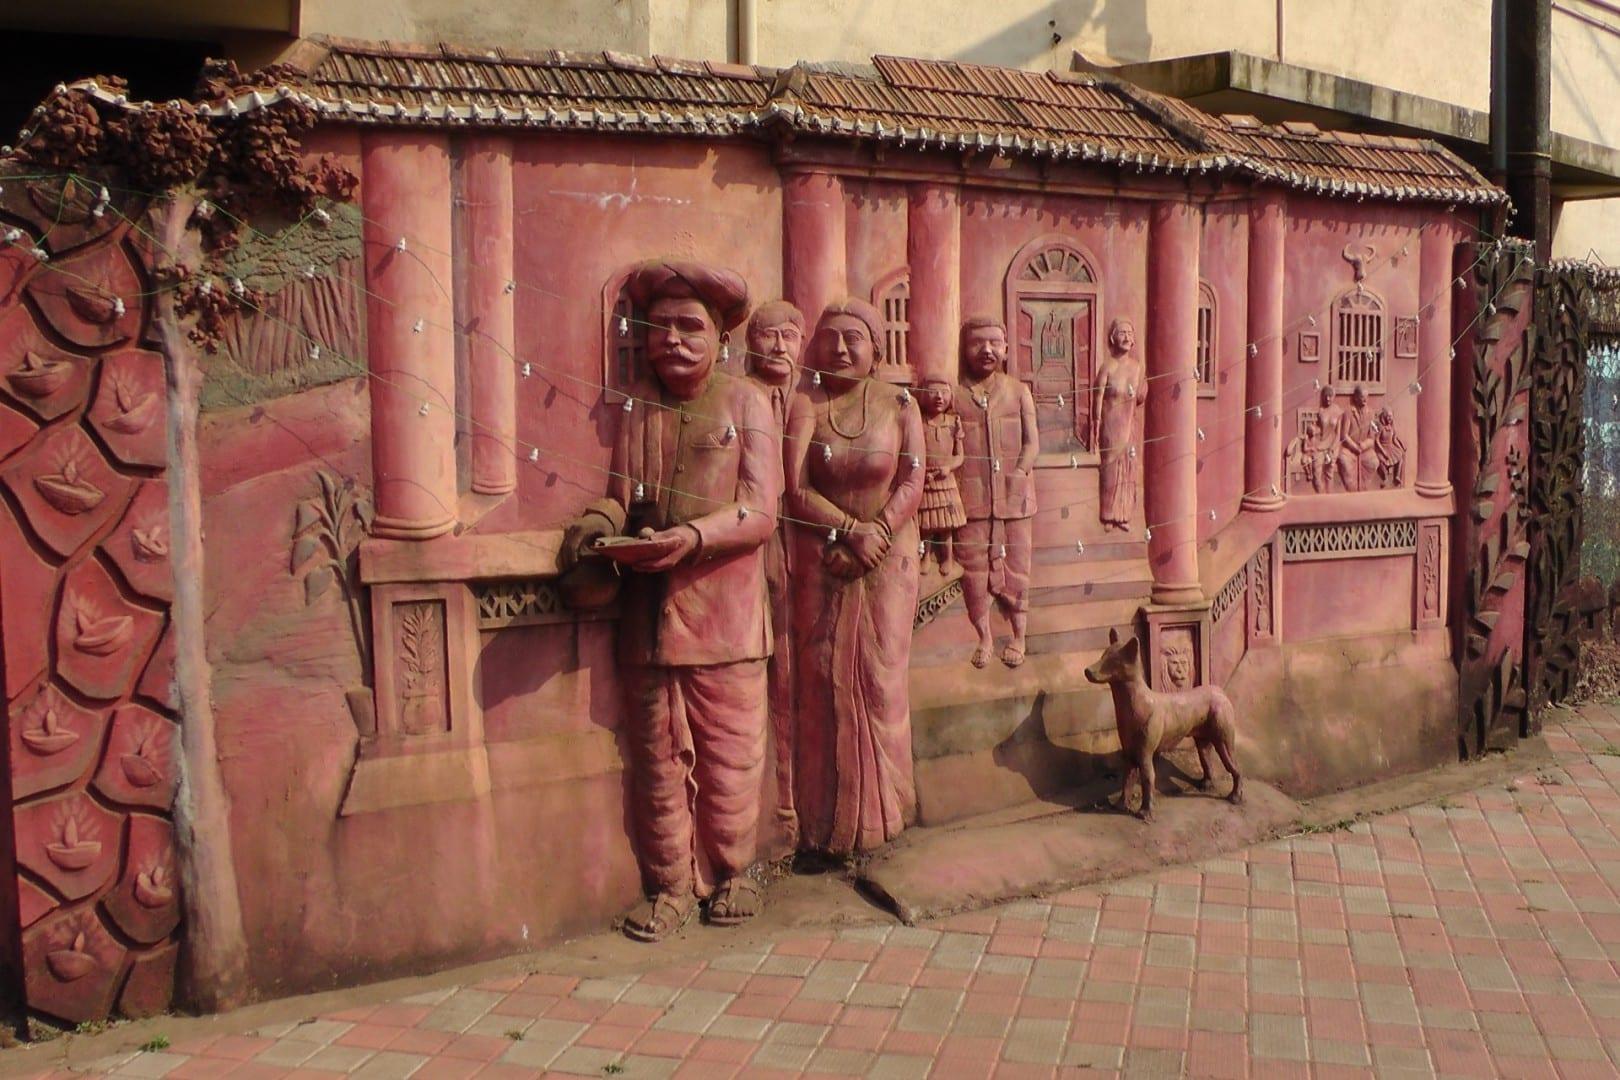 Centro de Patrimonio de Kalaanagann Konkani, Shakthi Nagar Mangalore India